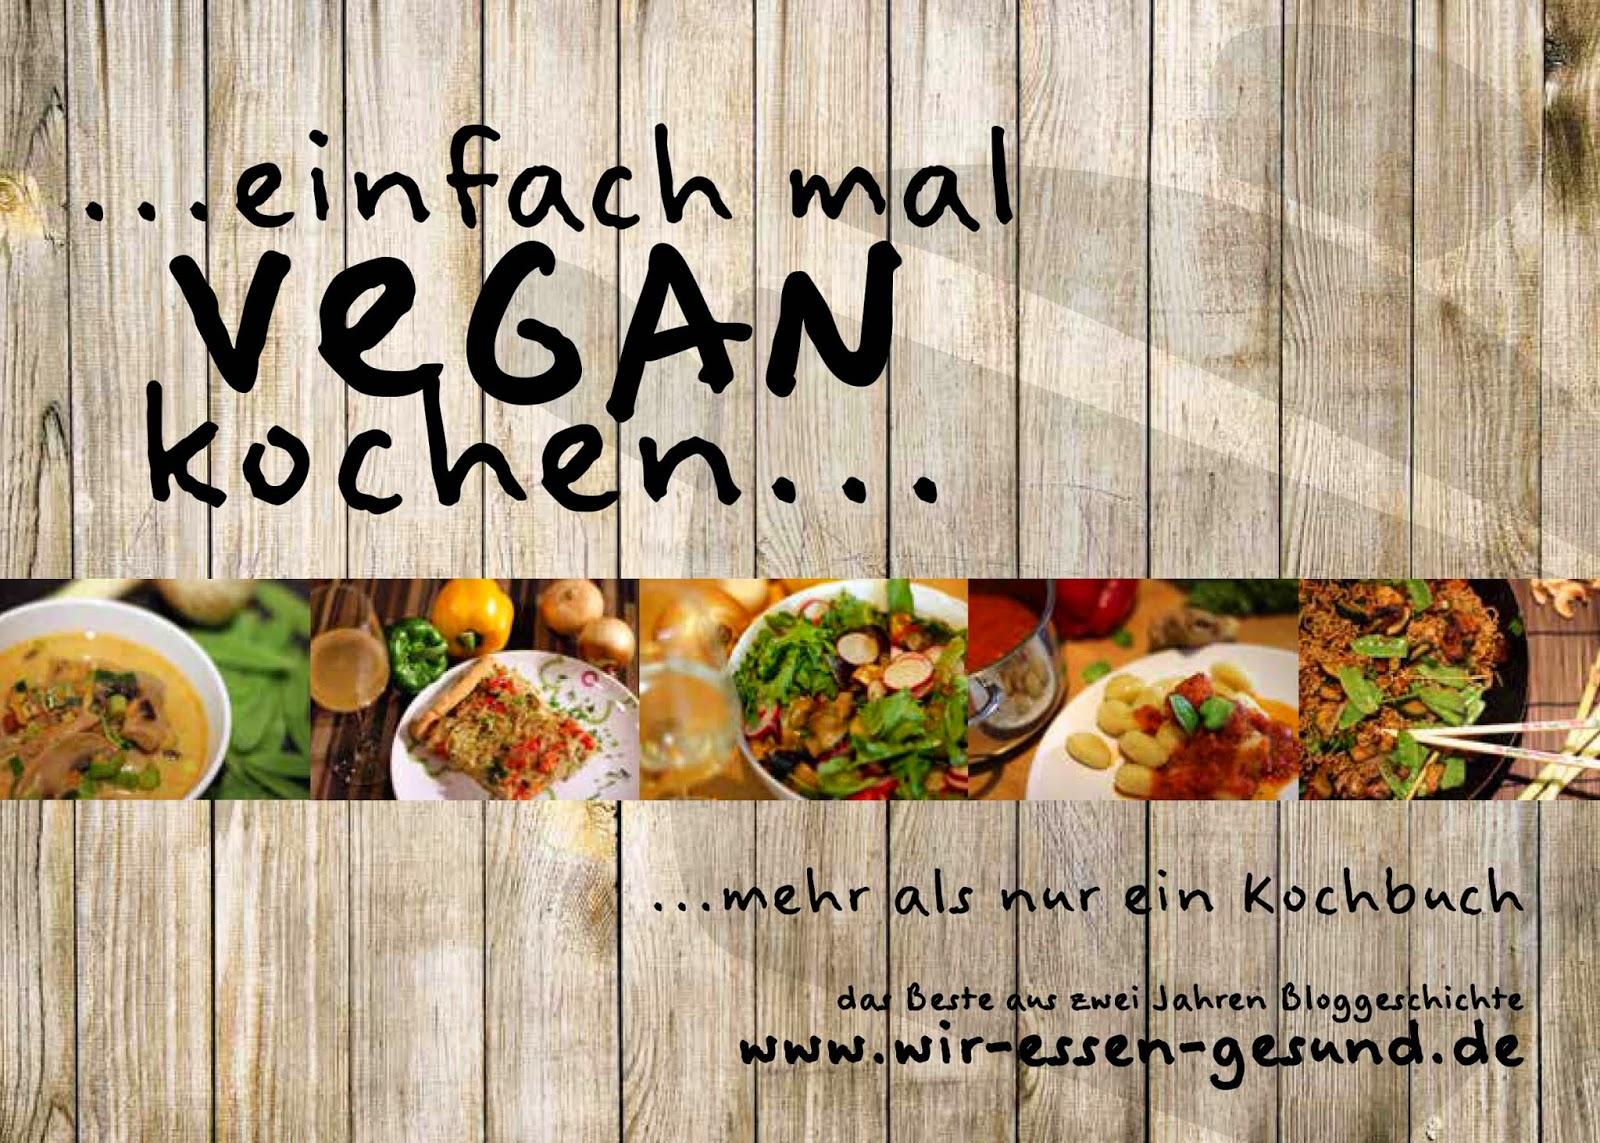 http://www.wir-essen-gesund.de/?pa=37